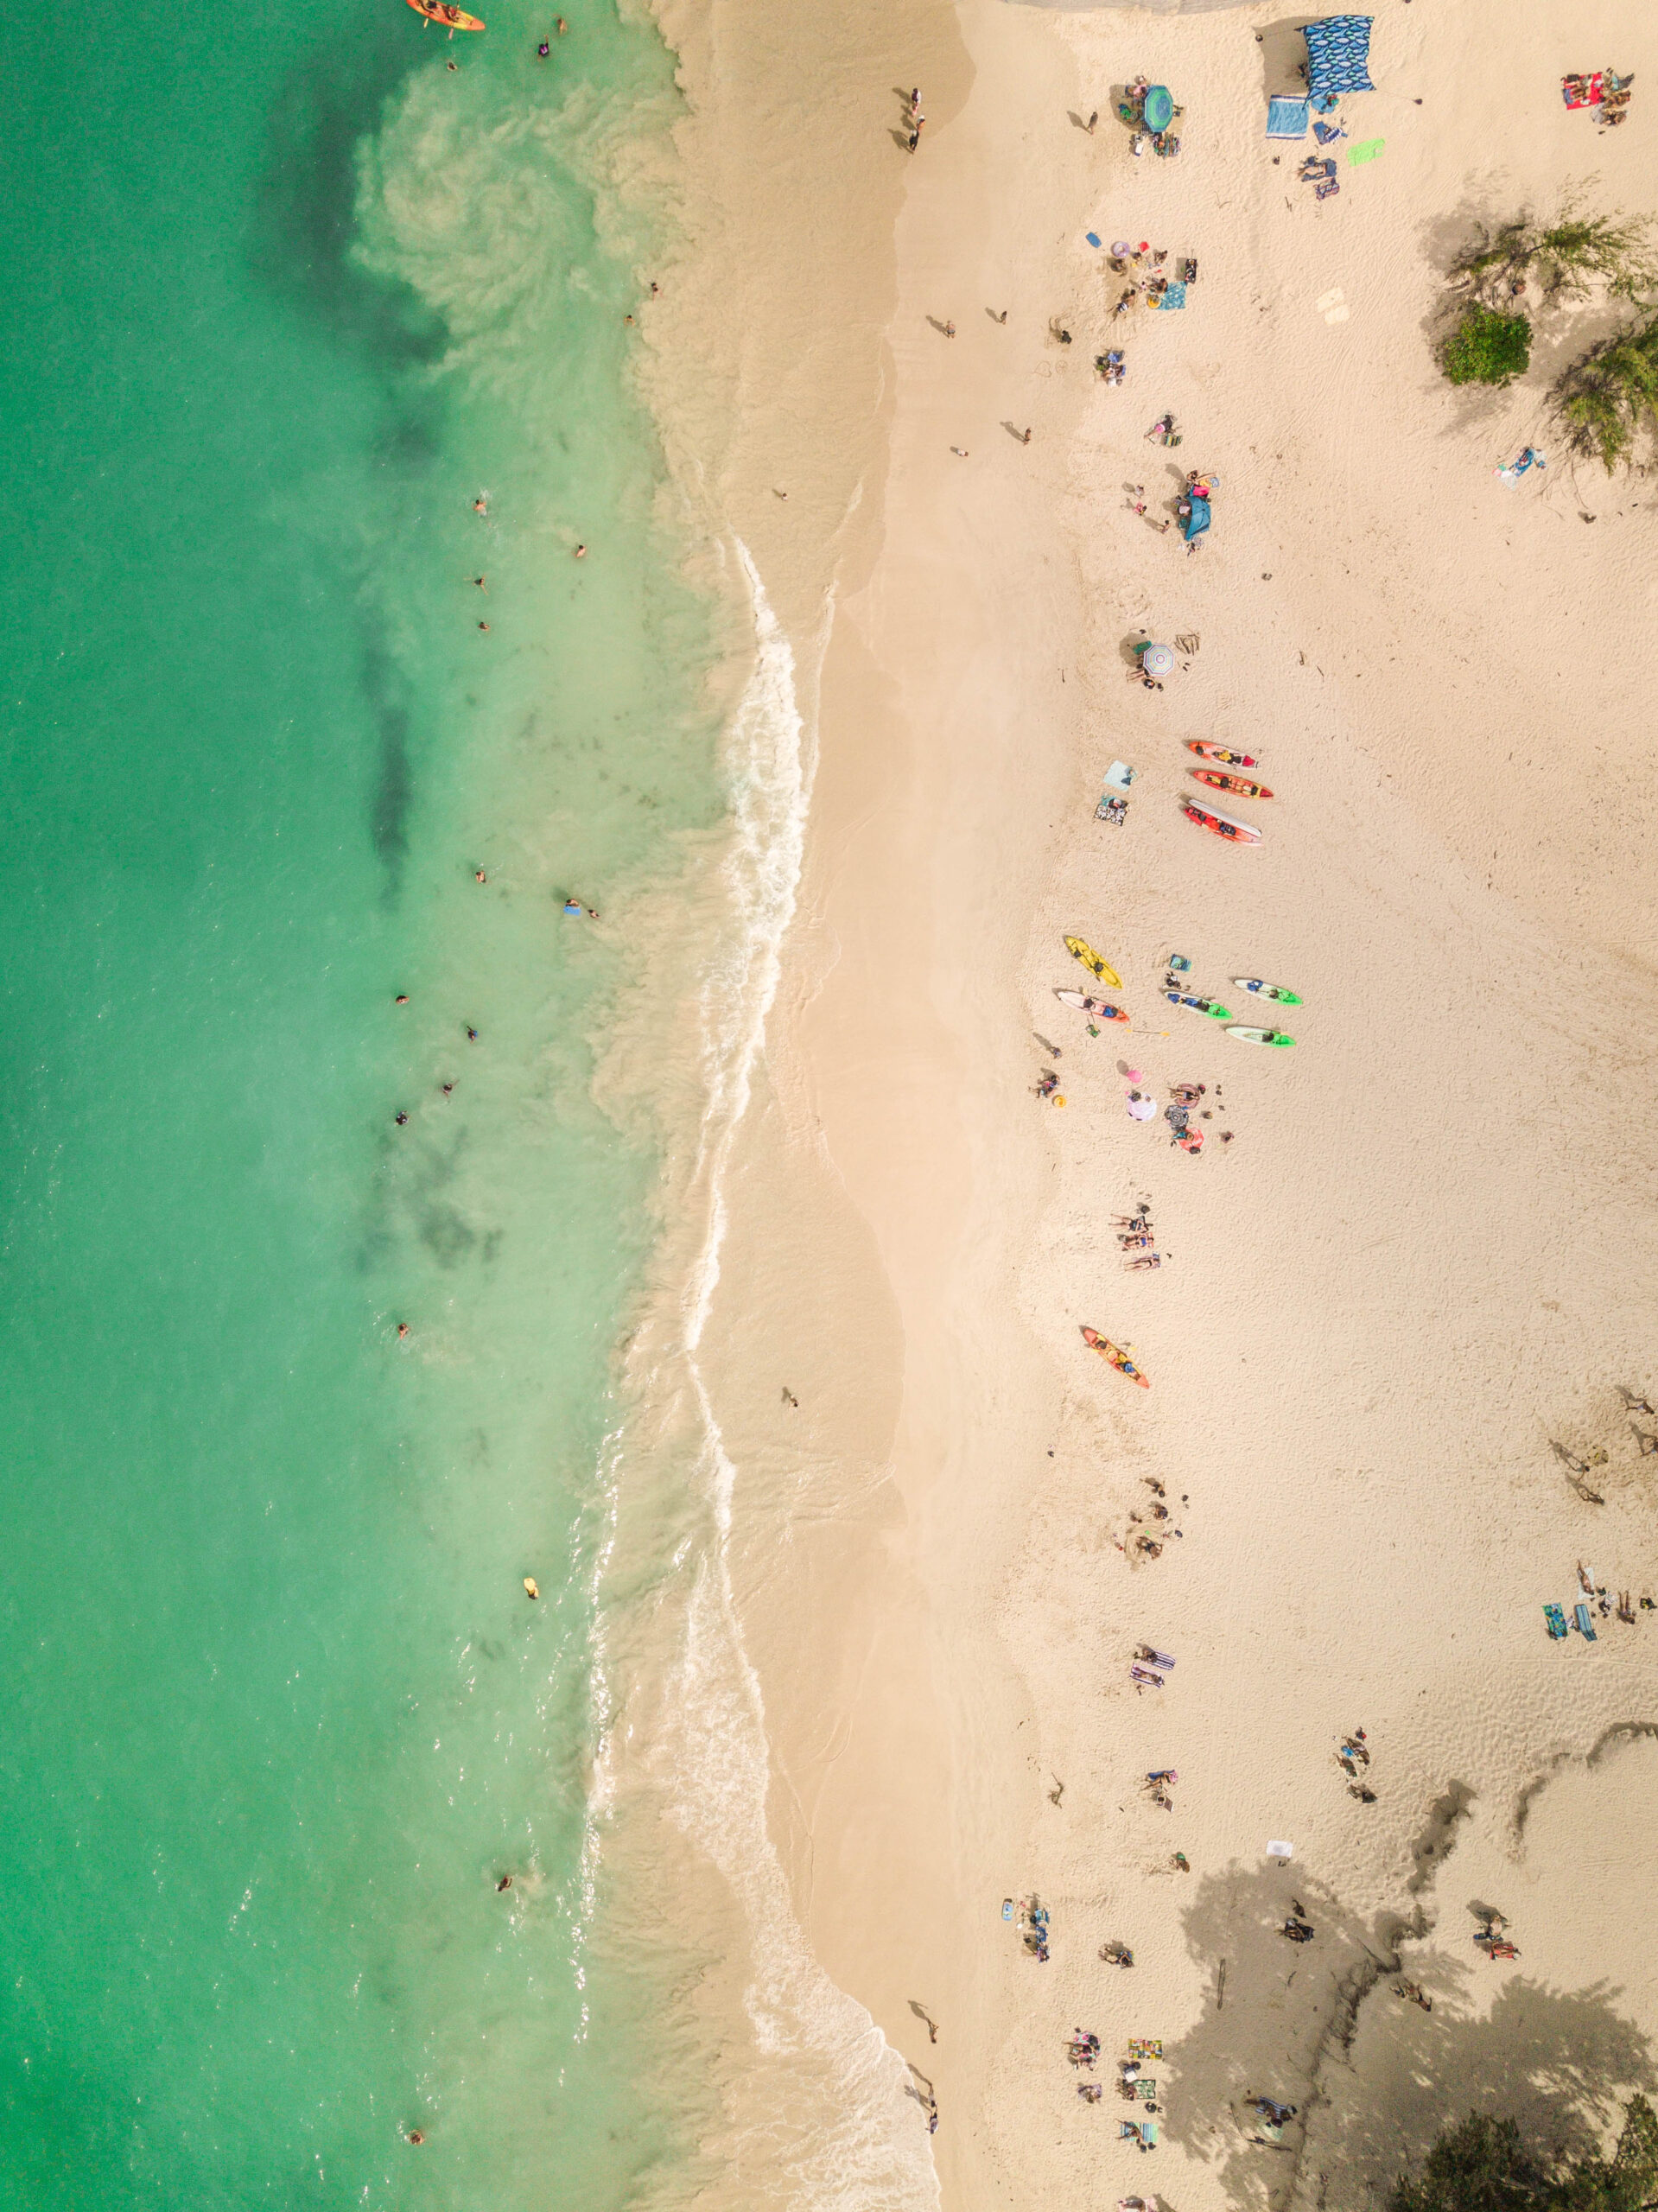 Kailua Beach Park Oahu Hawaii